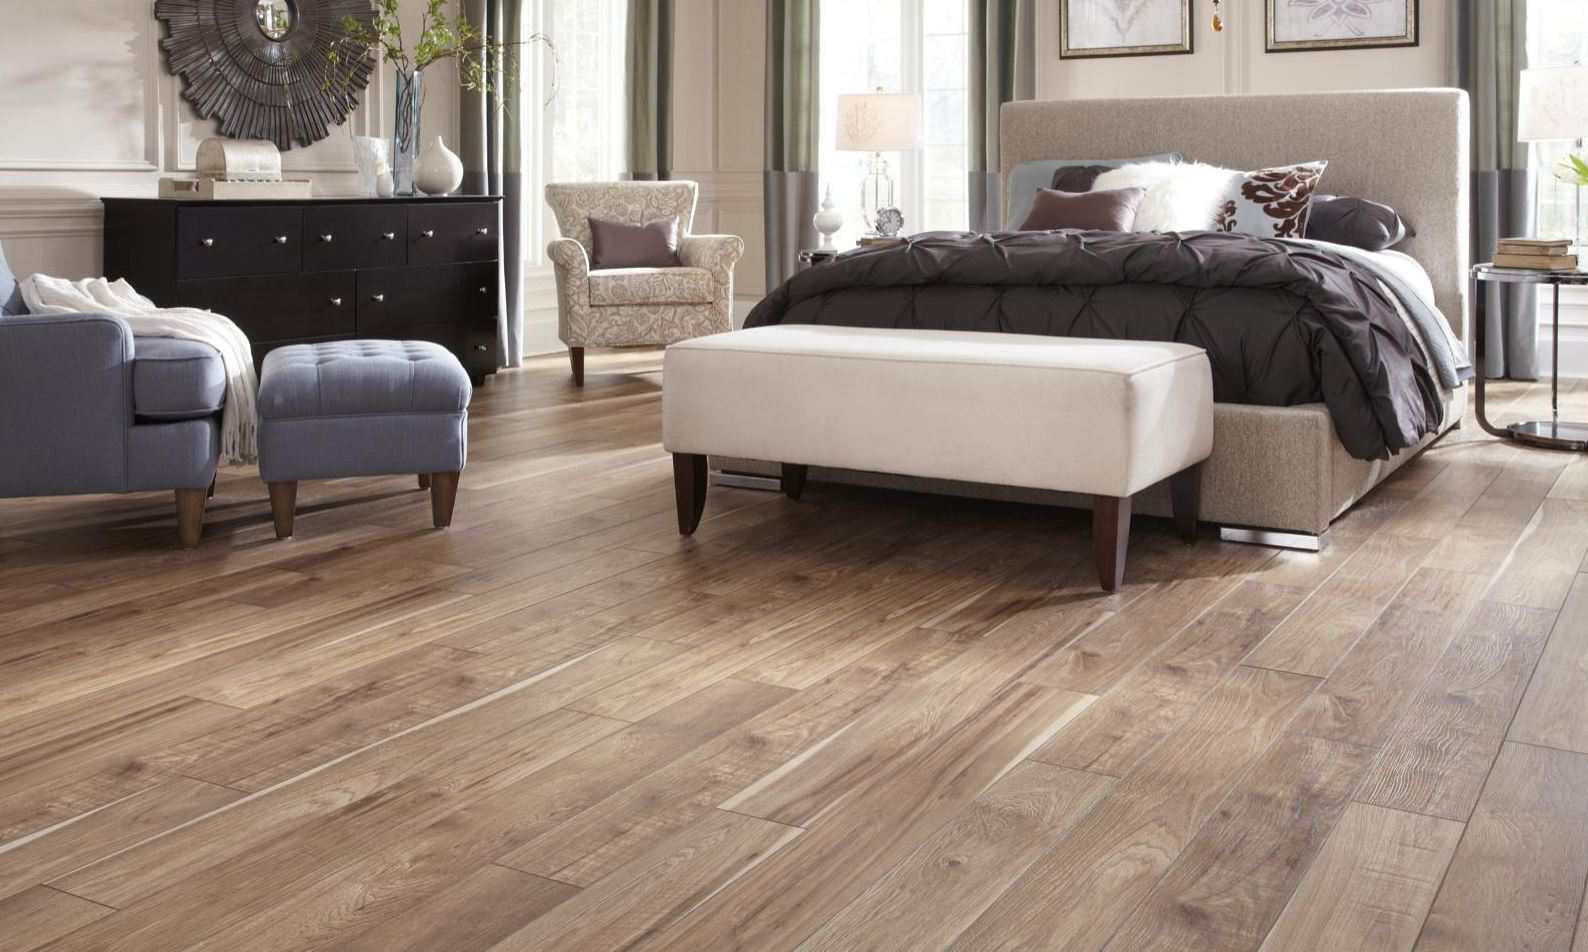 20 Amazing Vinyl Hardwood Flooring Lowes 2021 free download vinyl hardwood flooring lowes of luxury vinyl tile and plank flooring companies with regard to mannington adura luxury vinyl plank flooring